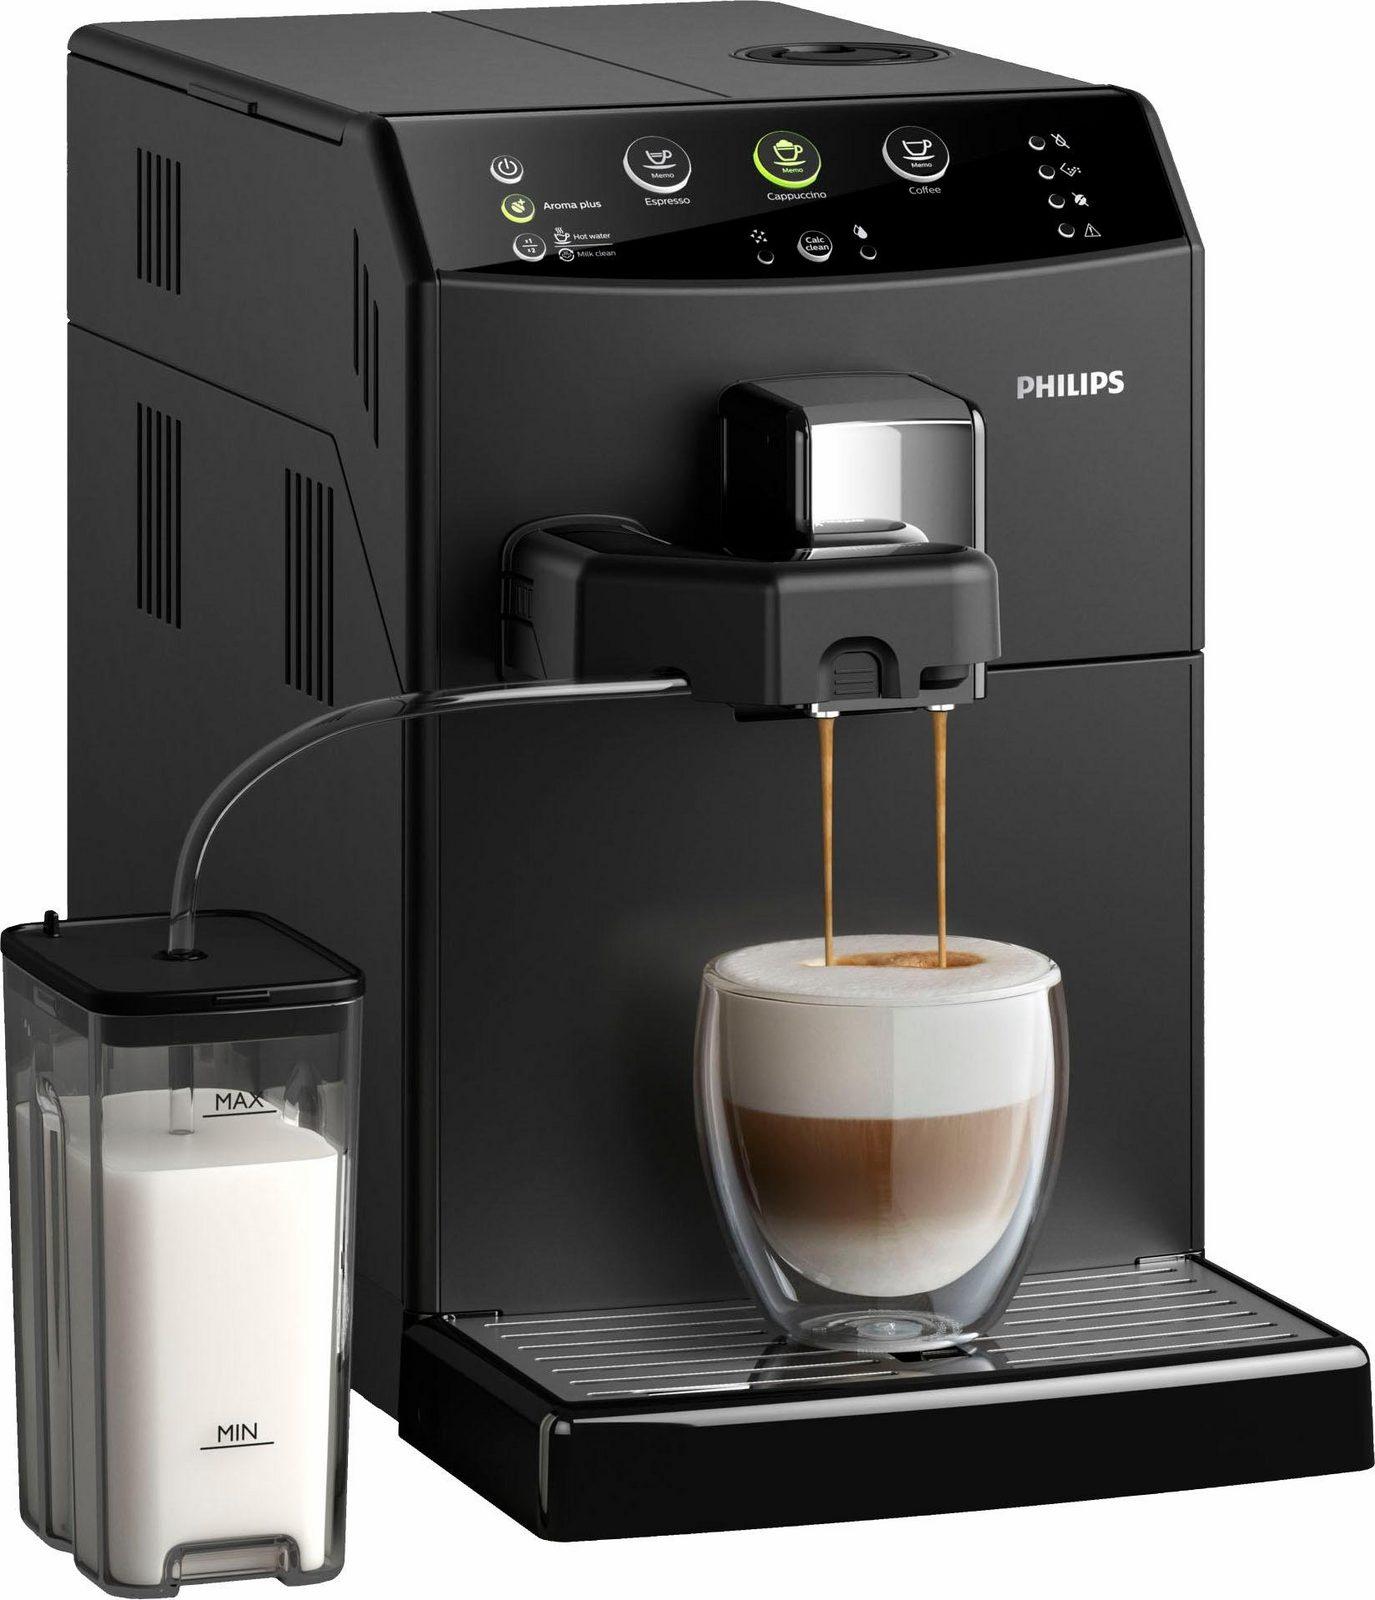 Philips Kaffeevollautomat Series 3000 HD8829/01 Easy Cappuccino, 1,8l Tank, Scheibenmahlwerk